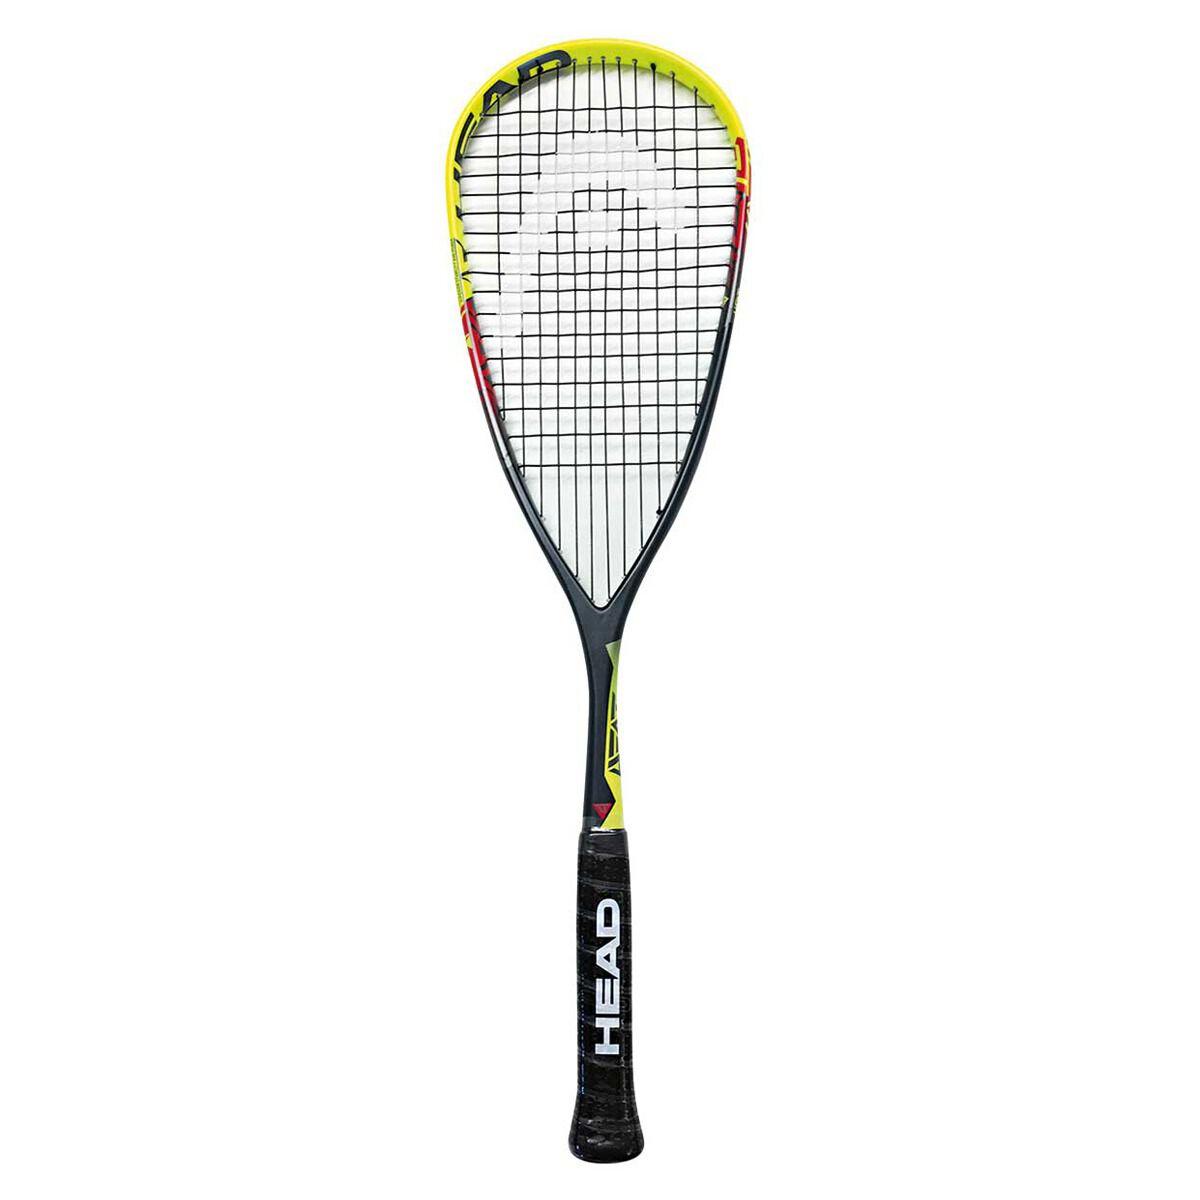 Adidas Squash Shoes, Racket Sport Specialists | Squash